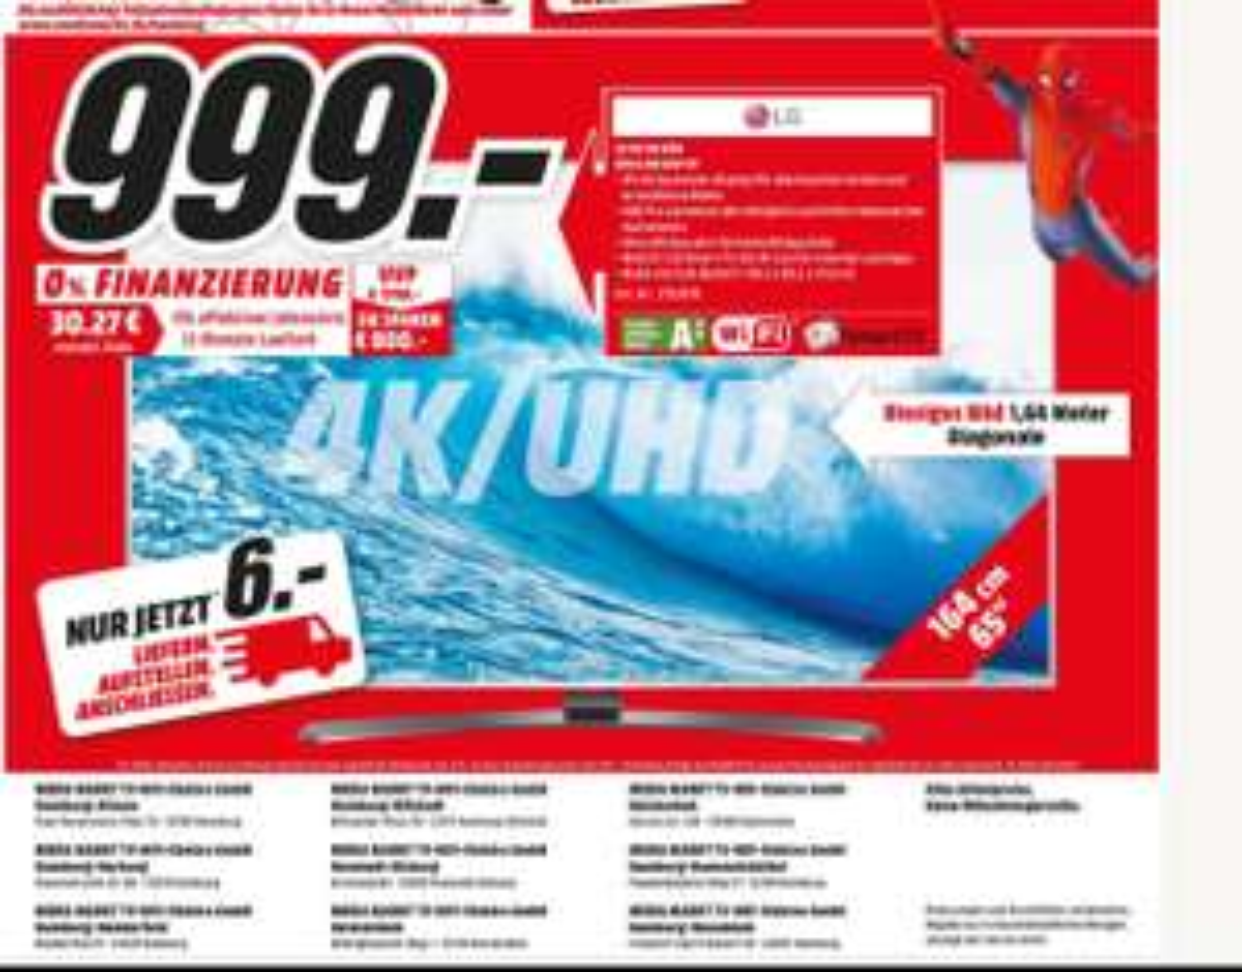 LG 65 UH 668 4K UHD + HDR PRO nur 999€ statt 1499€